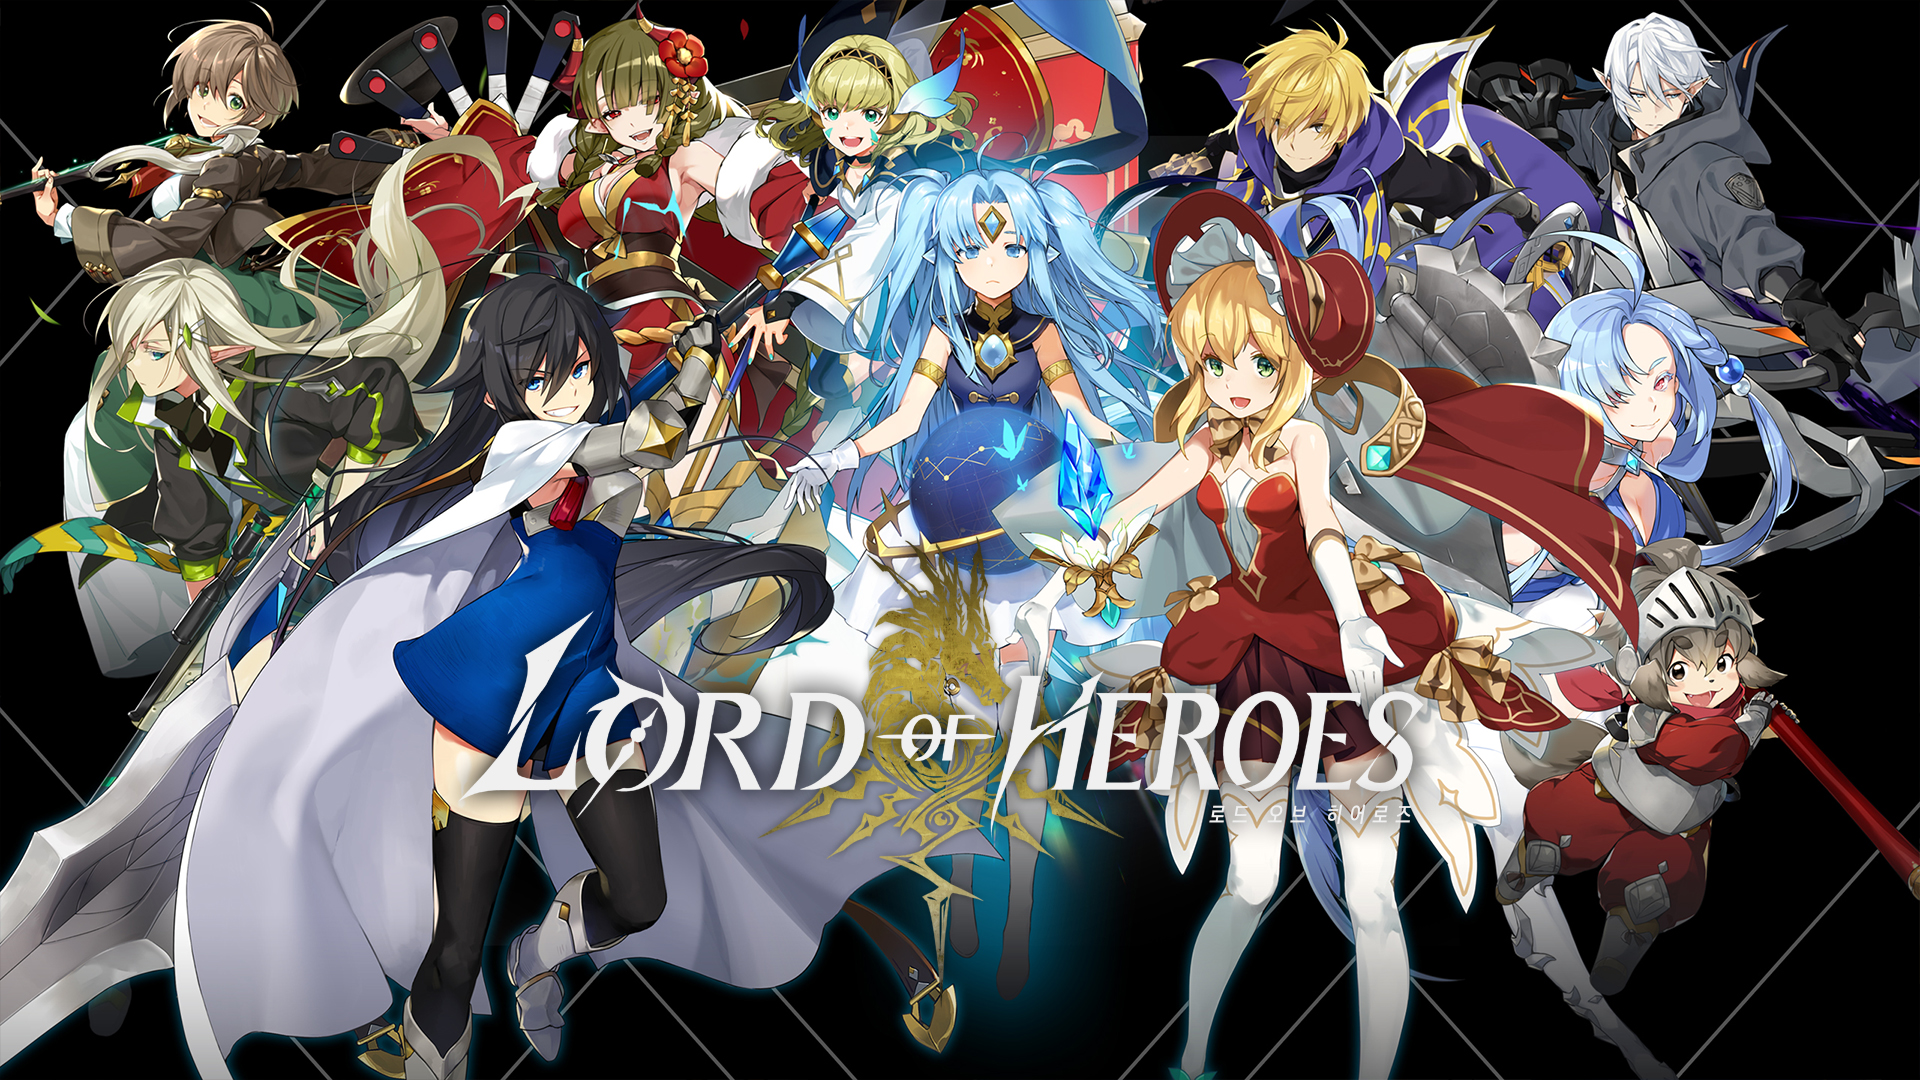 Lord of Heroes un MMORPG de clovergames.